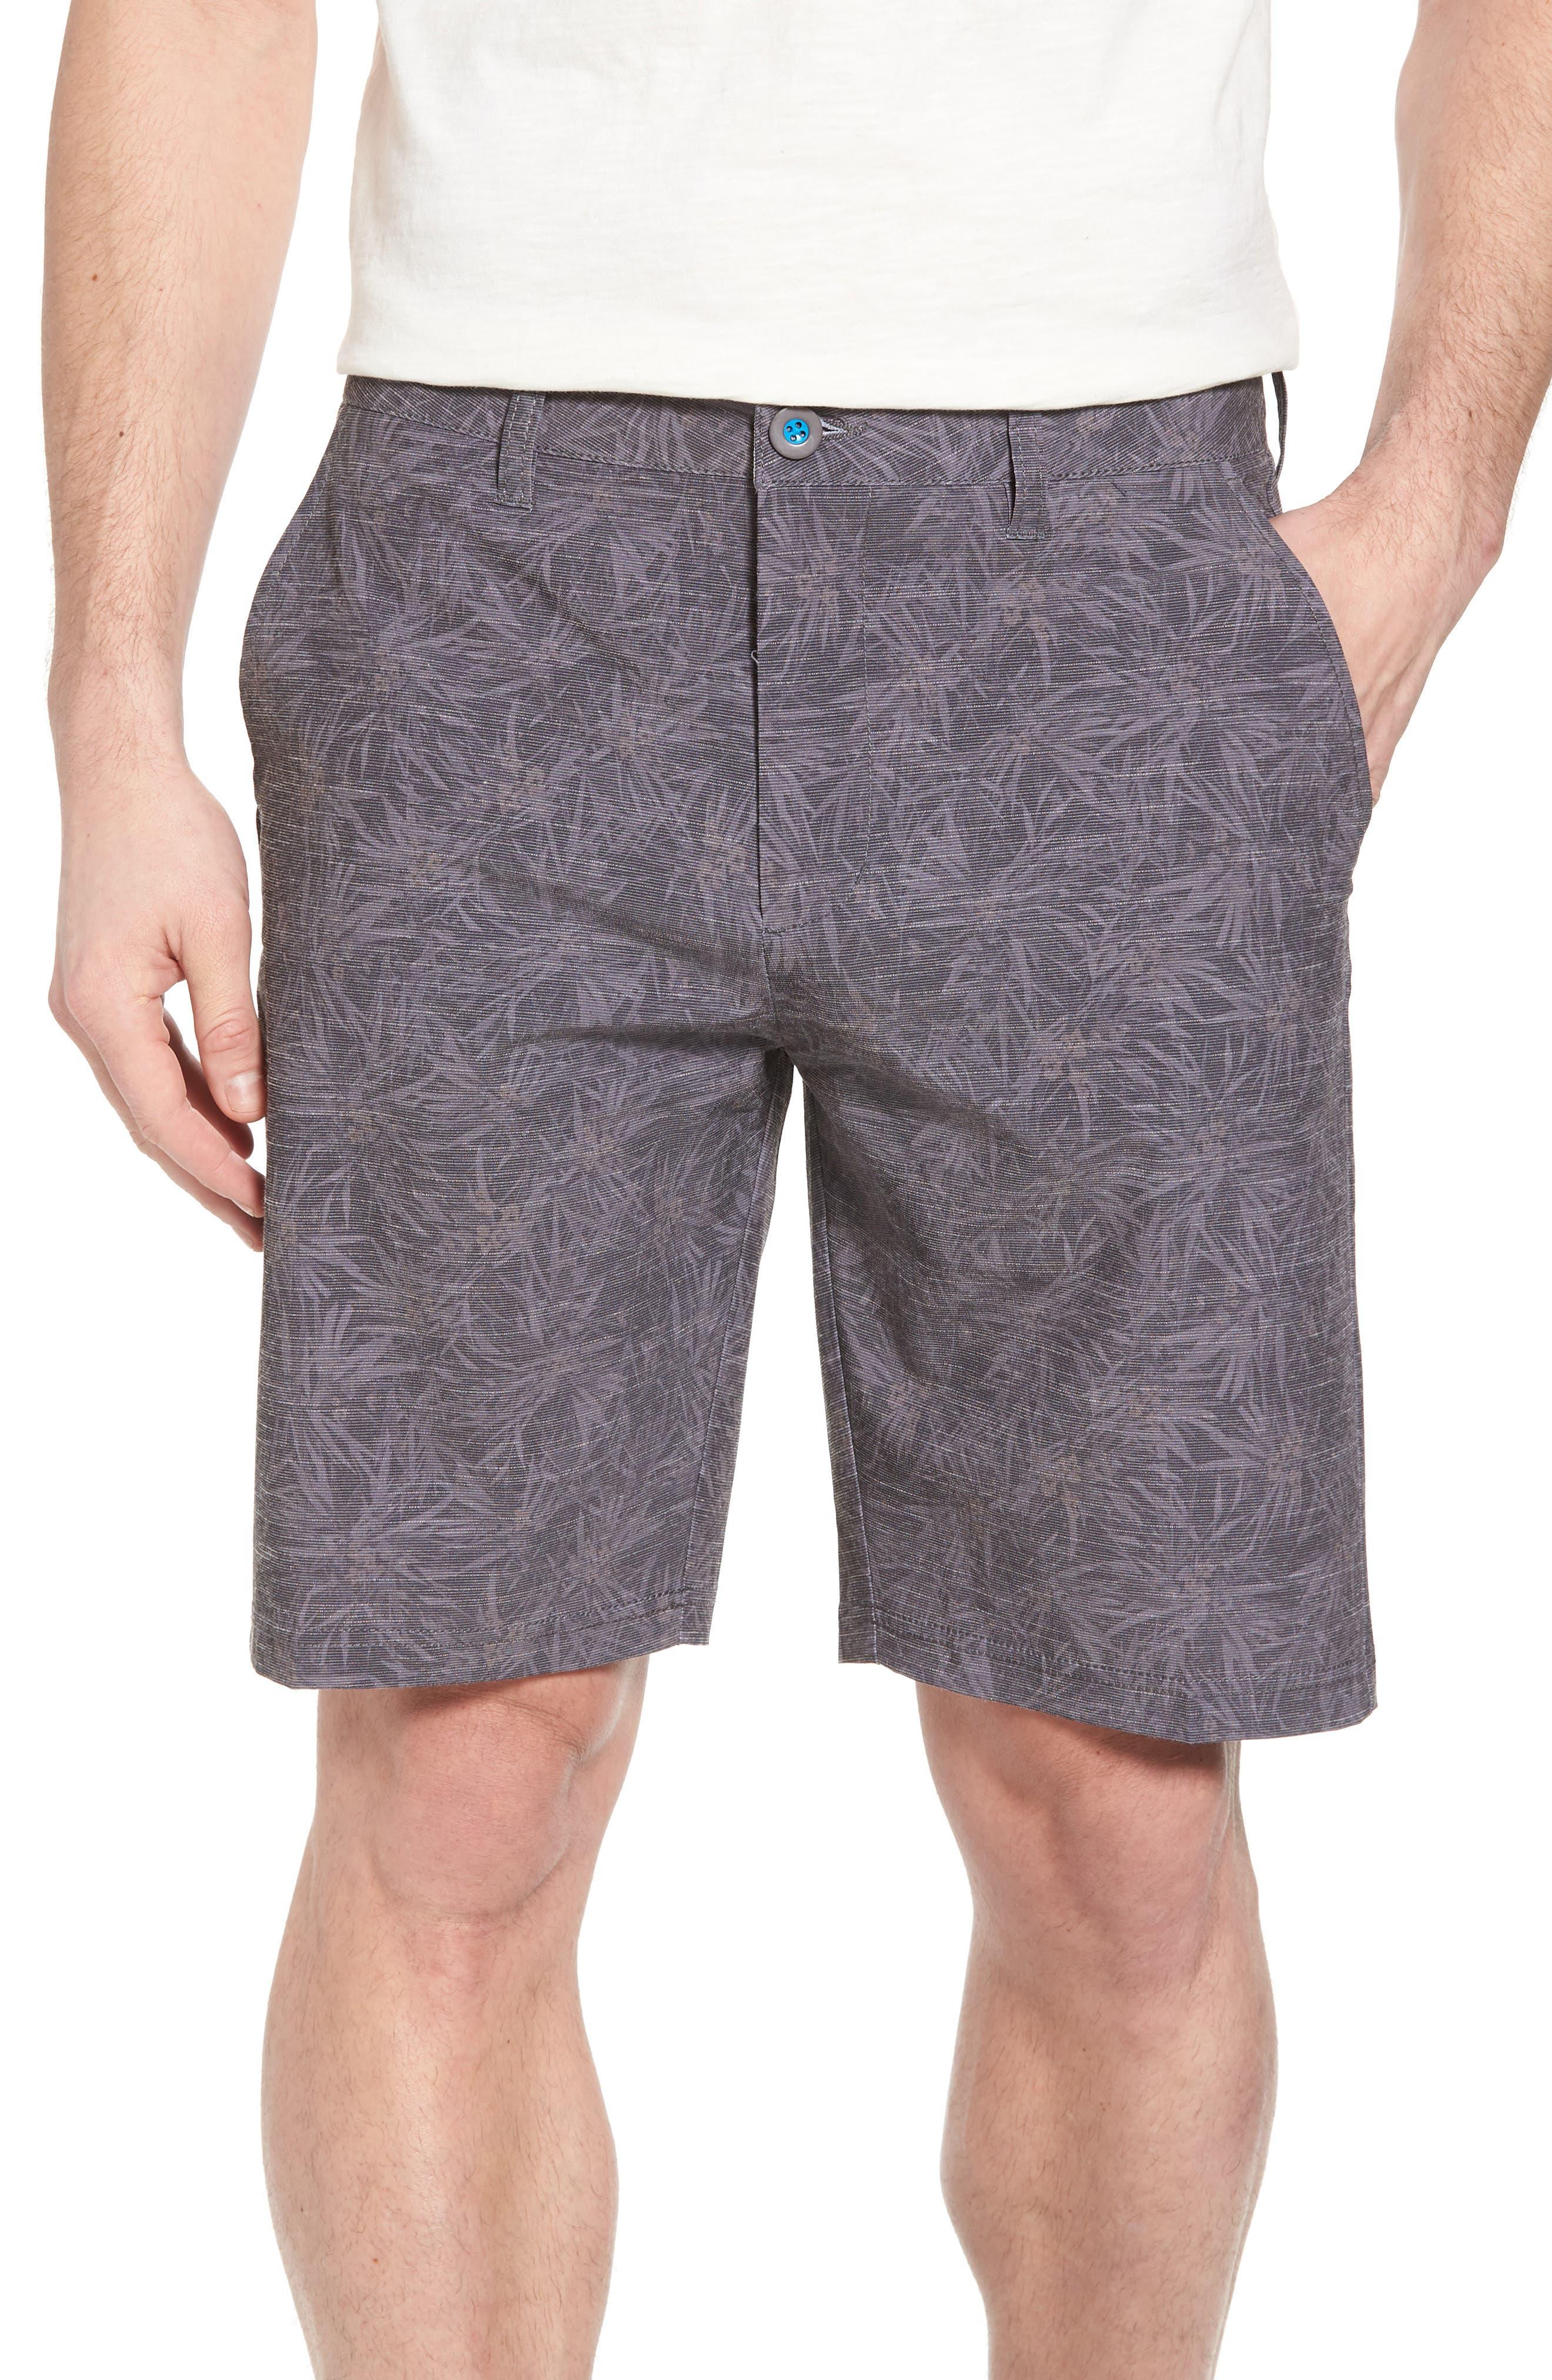 Devereux Cruiser Hybrid Shorts